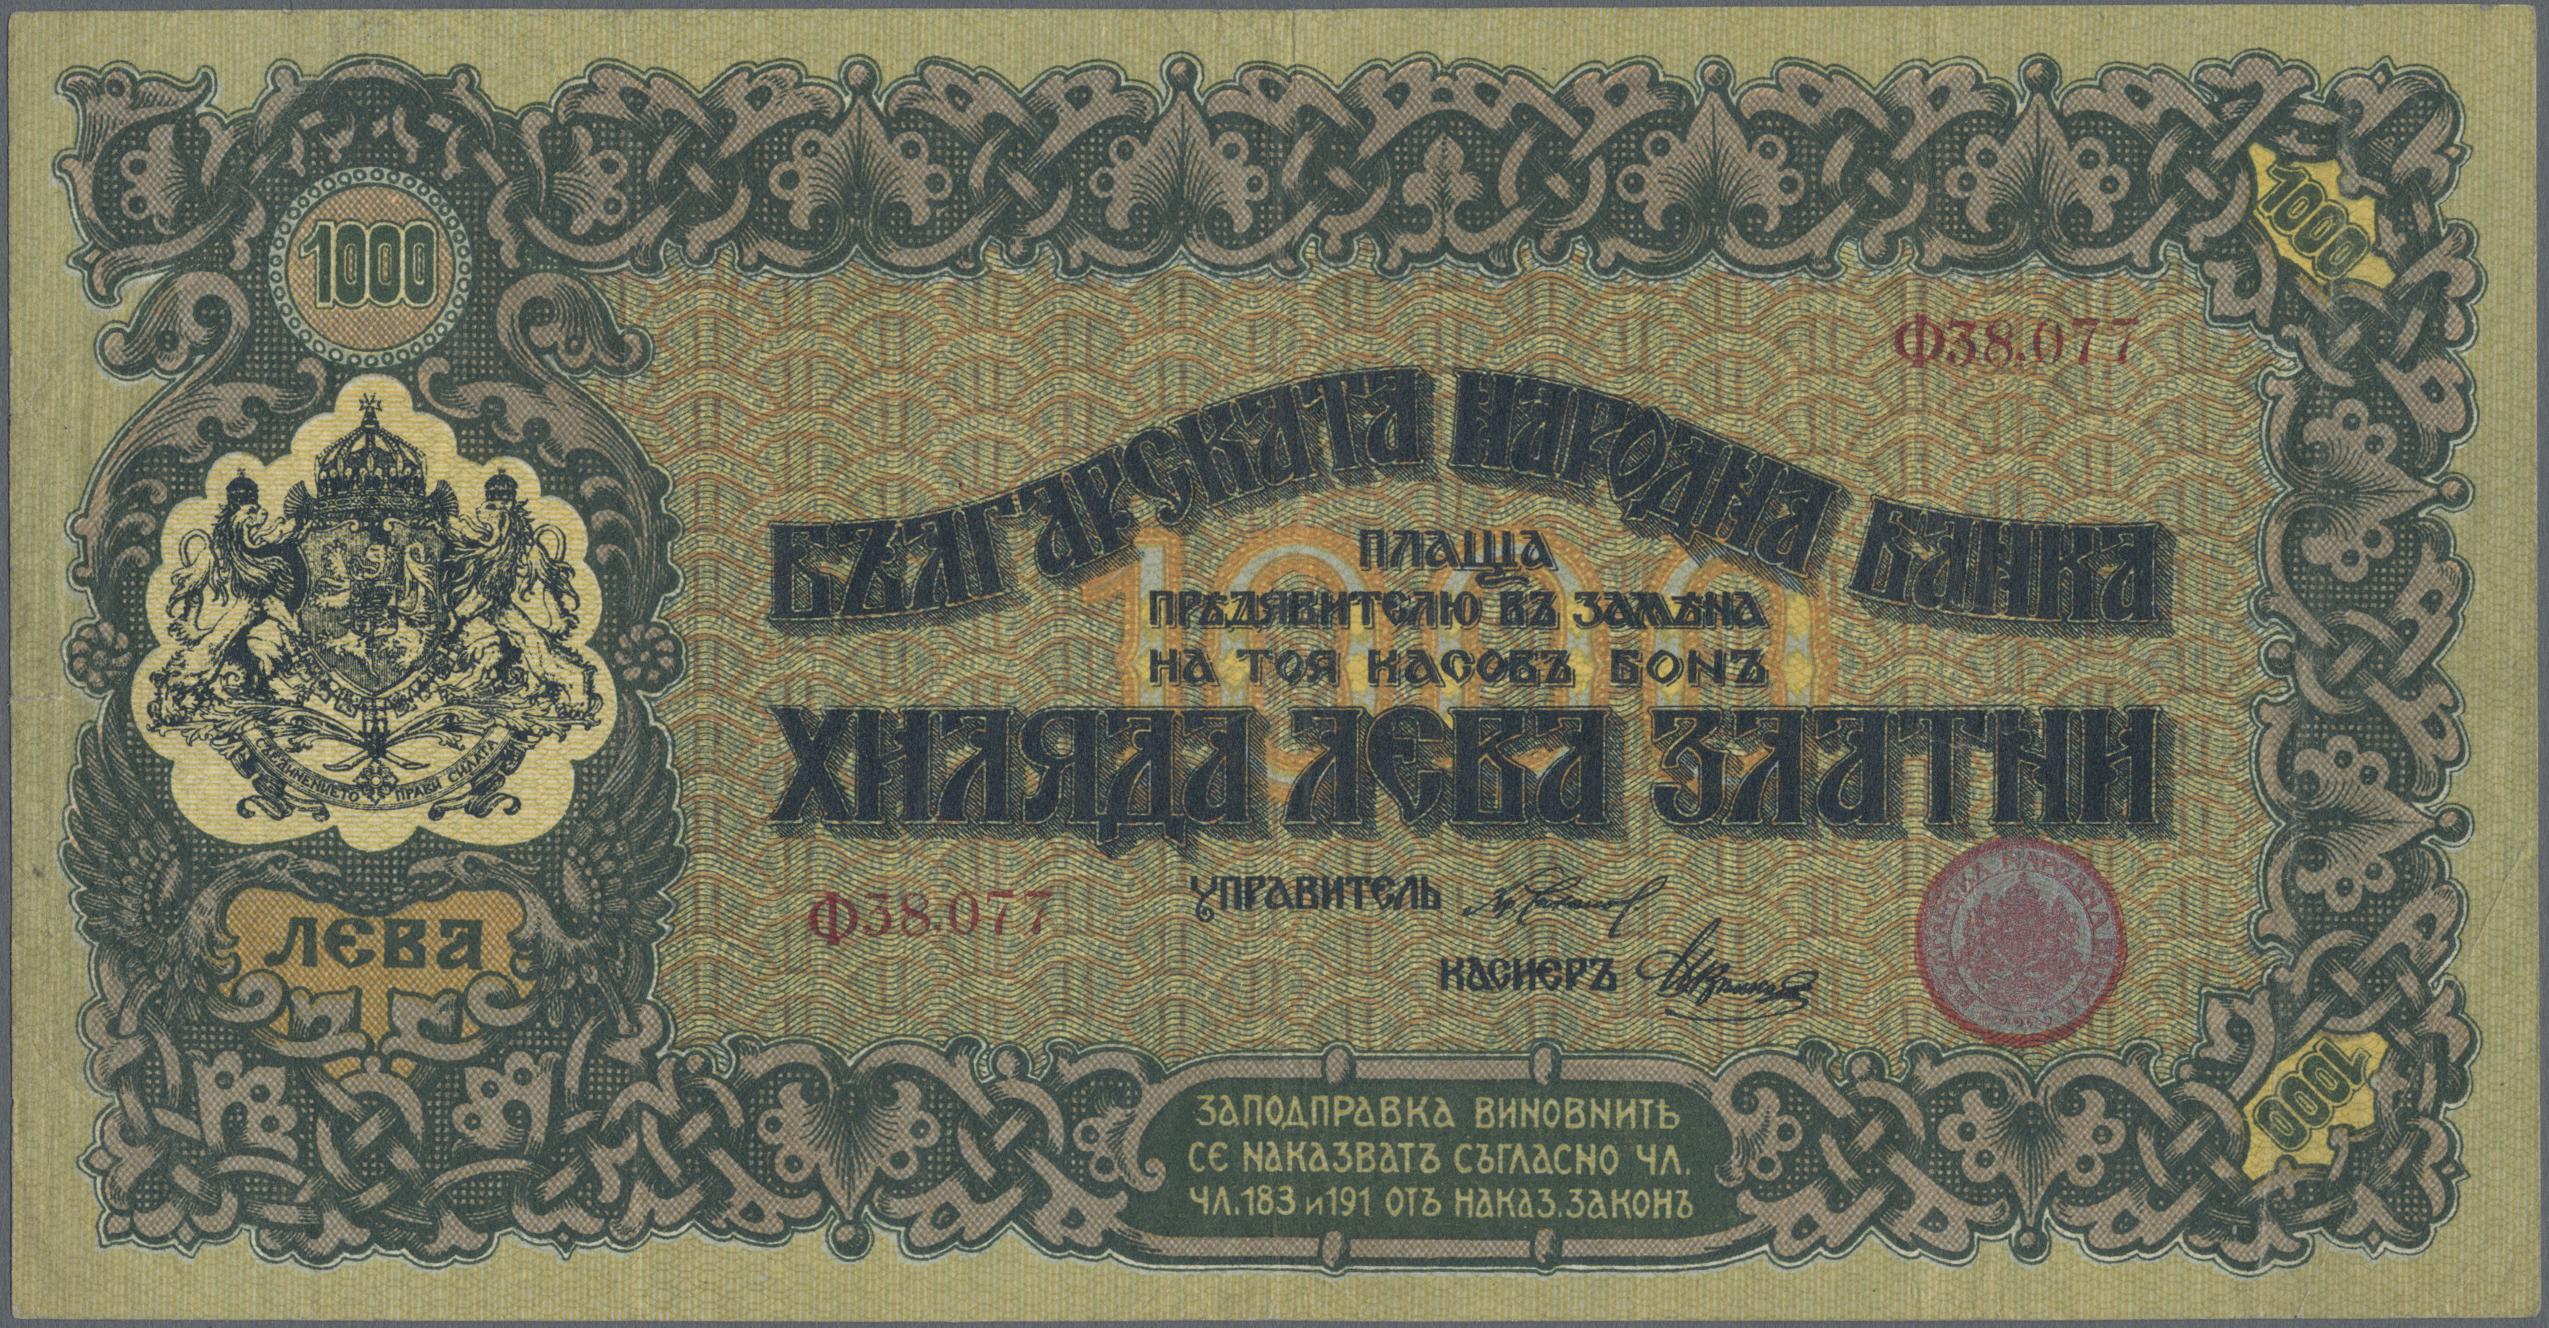 Lot 00218 - Bulgaria / Bulgarien | Banknoten  -  Auktionshaus Christoph Gärtner GmbH & Co. KG Sale #46 The Banknotes Worldwide section of the 46th Christoph Gärtner Auction